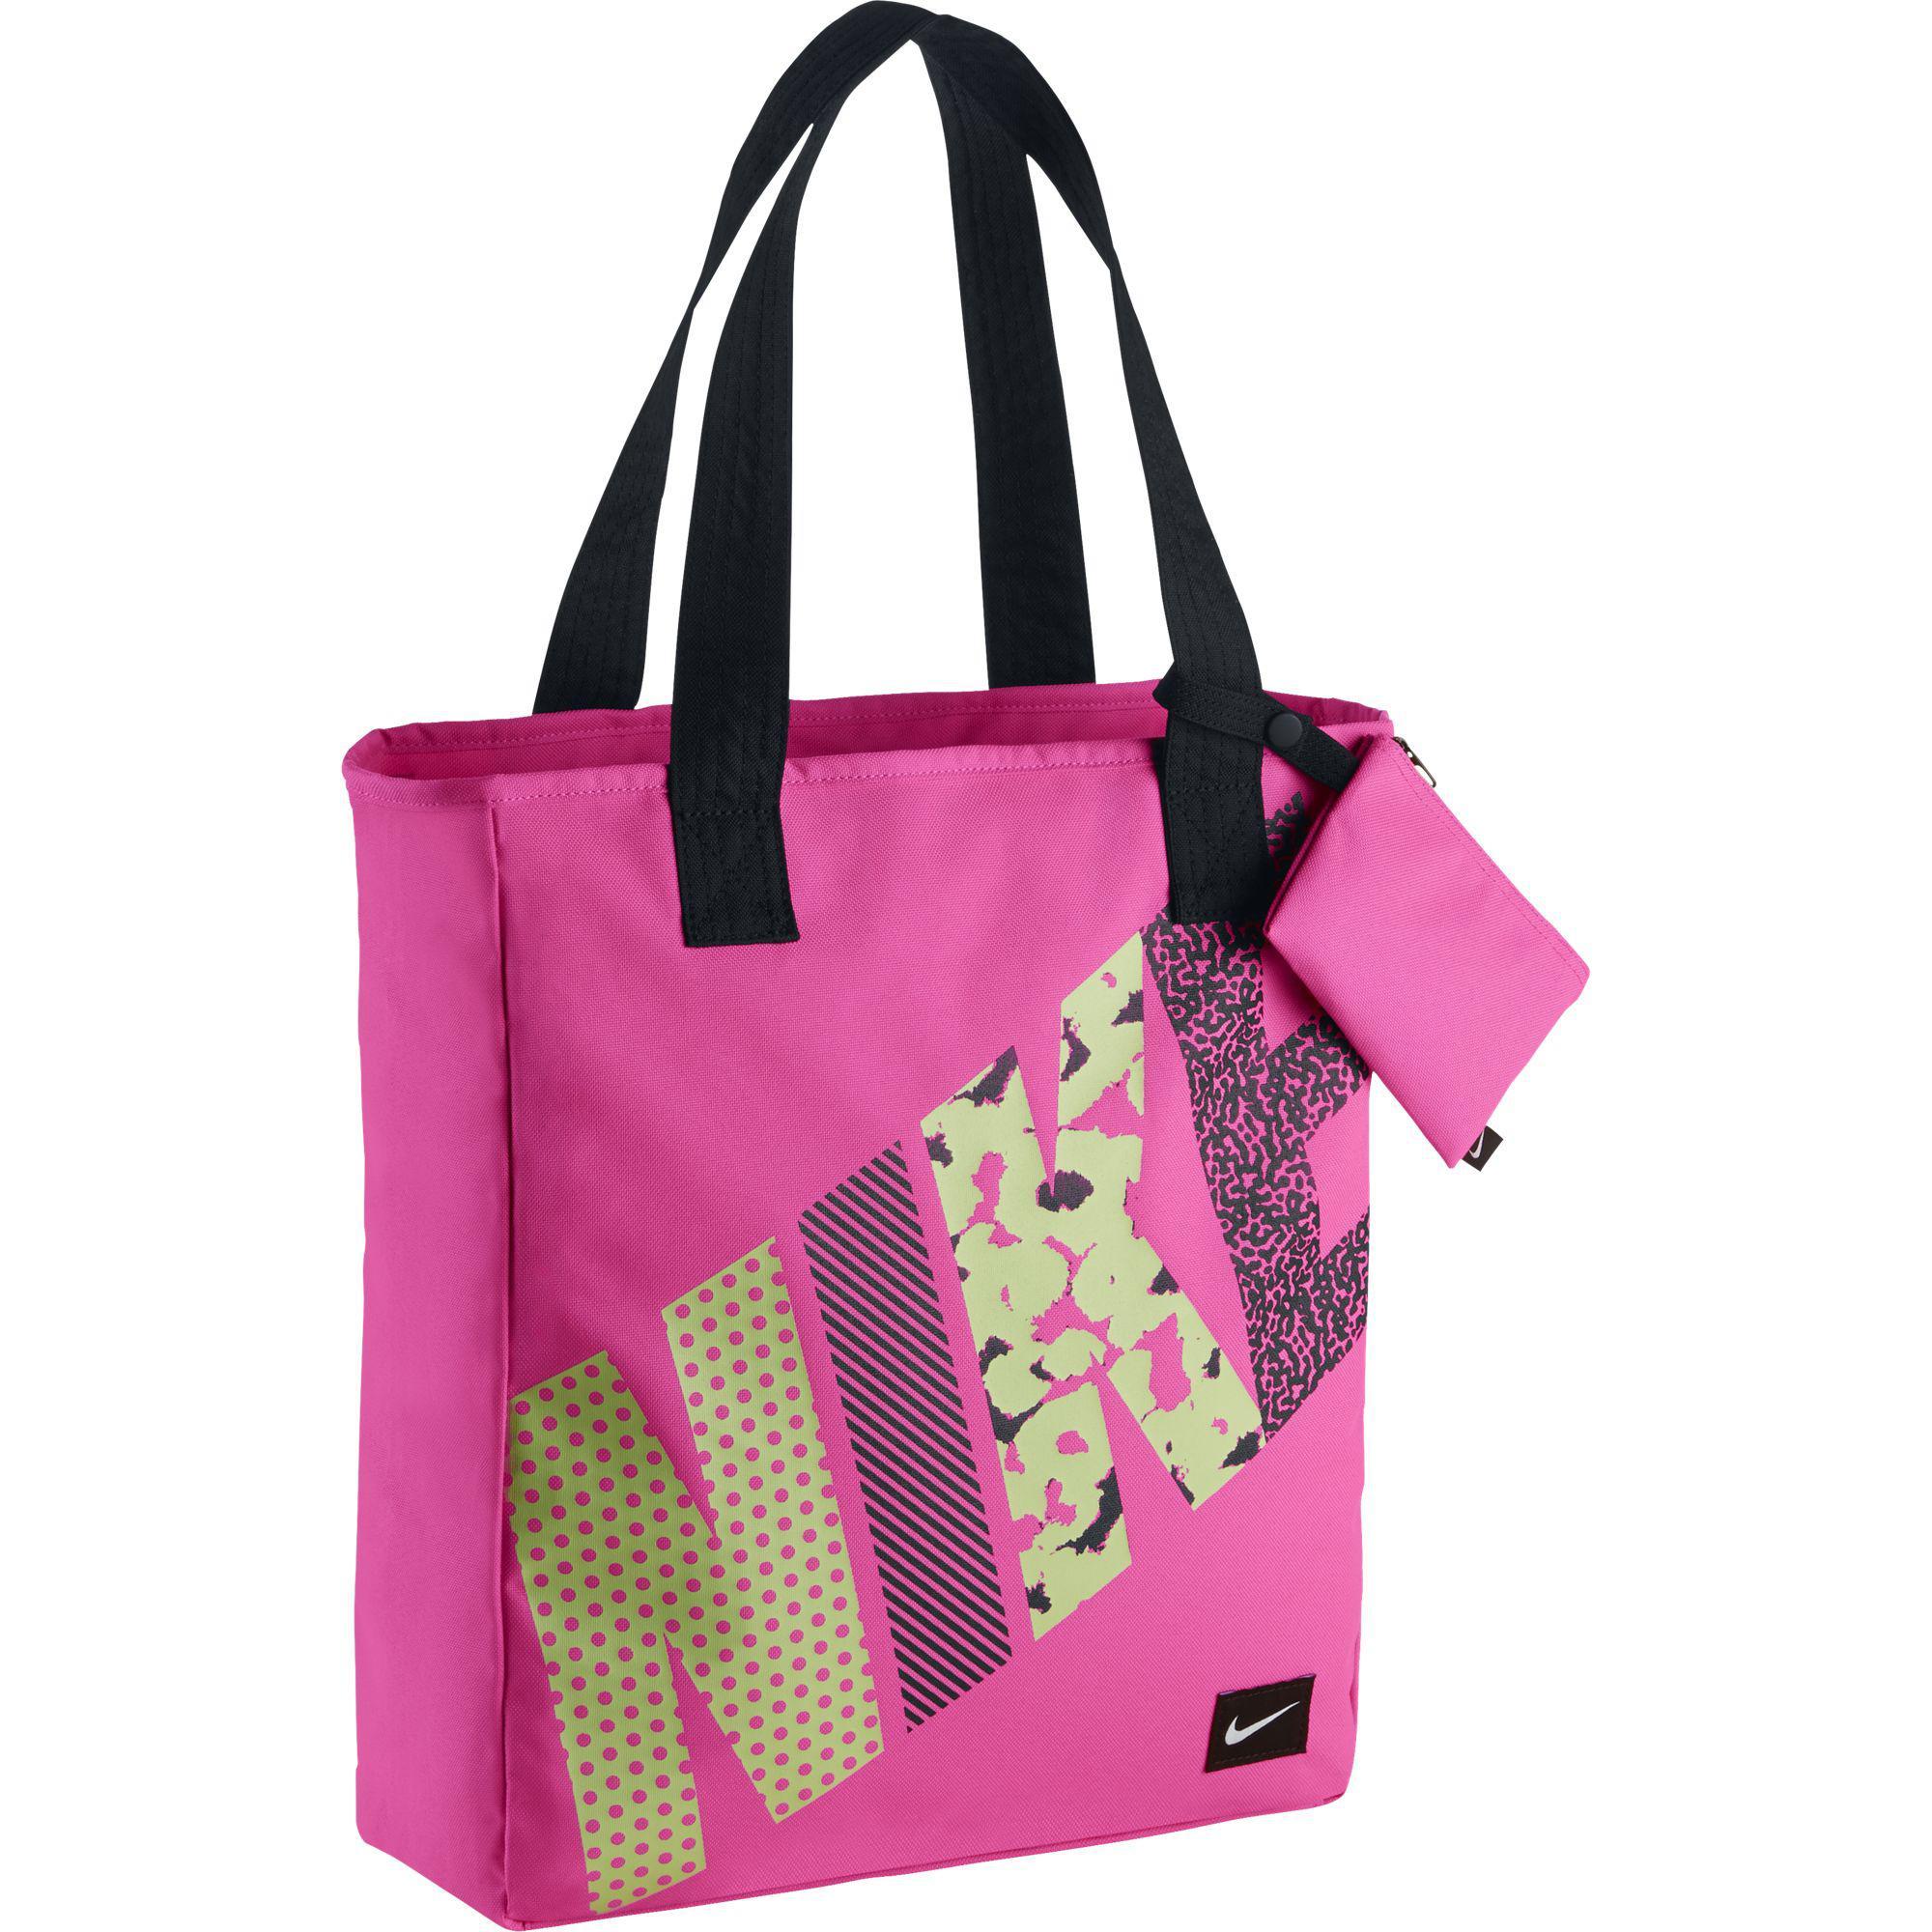 2a87b867dc5d Nike Rowena Kids Tote Bag - Pink Pow Black - Tennisnuts.com